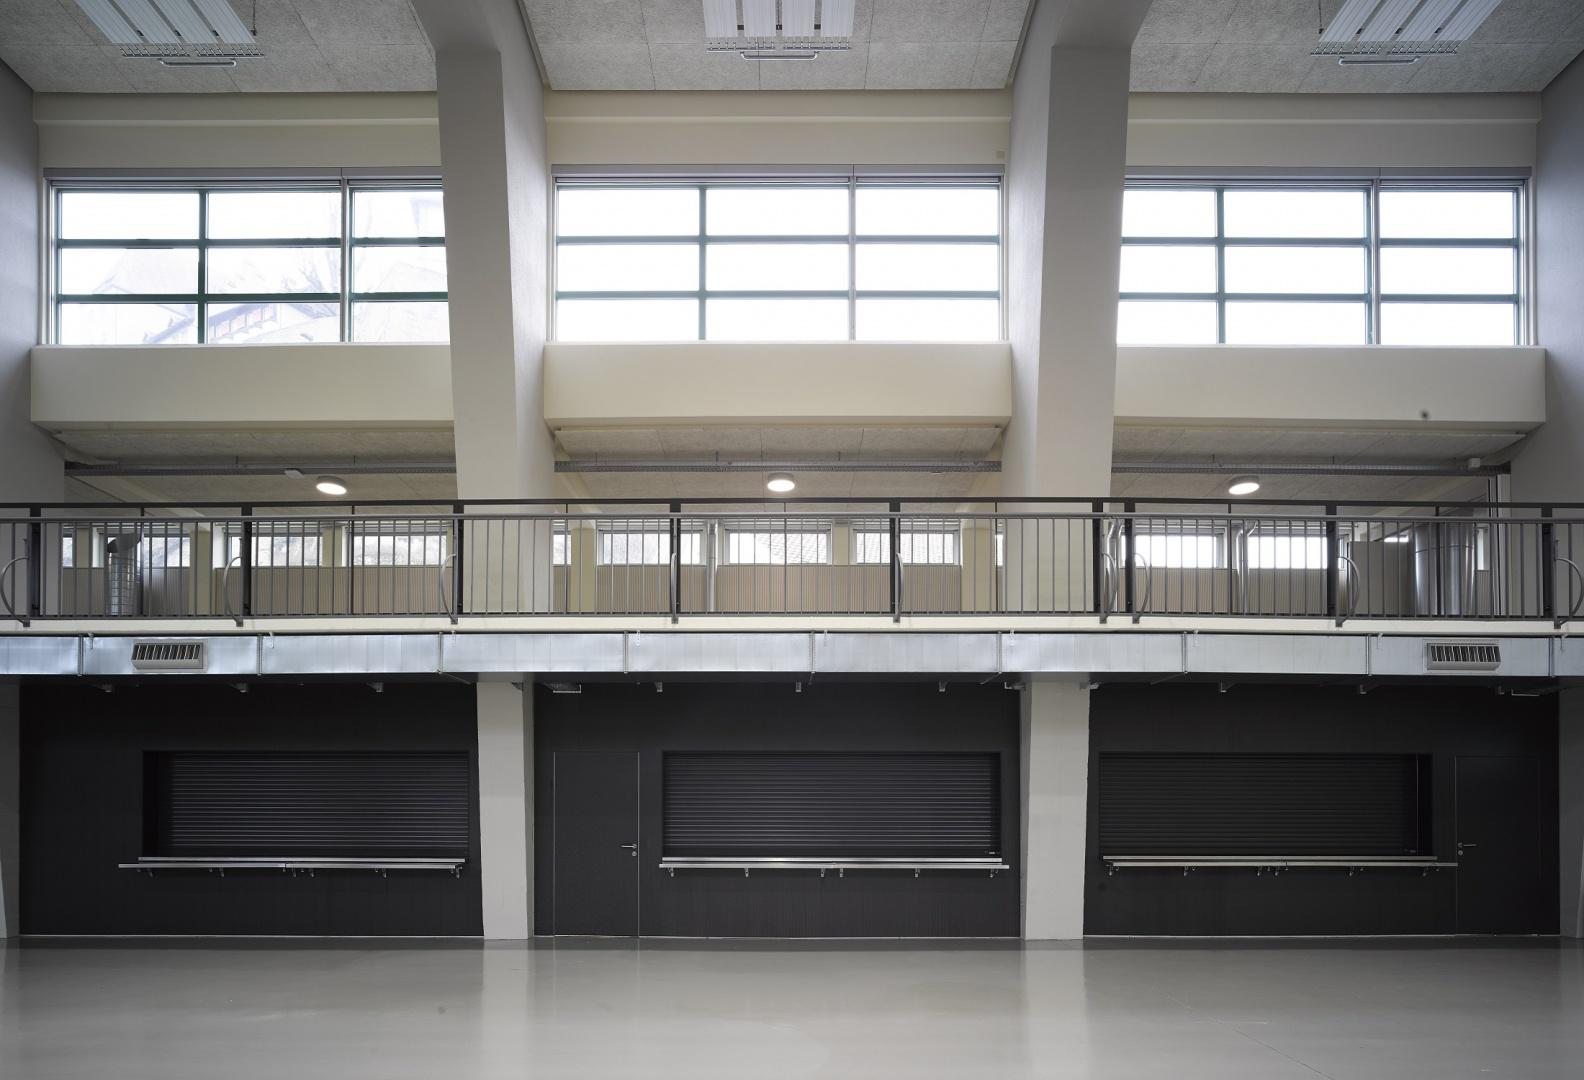 Markthalle, Halle © Manuel Stettler, Fotograf, Burgdorf